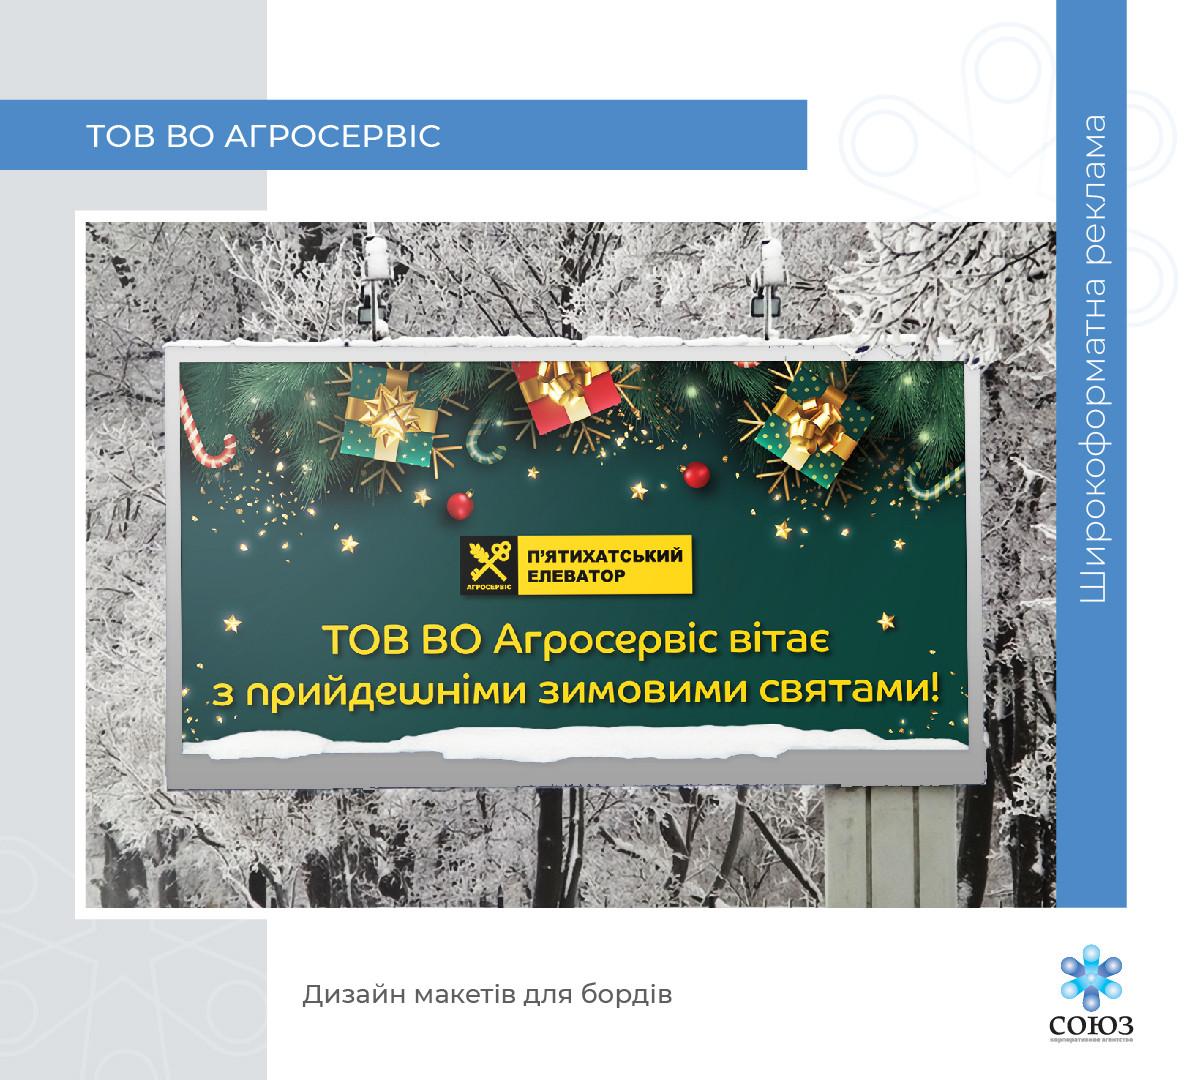 mh_design present 2021-08.jpg